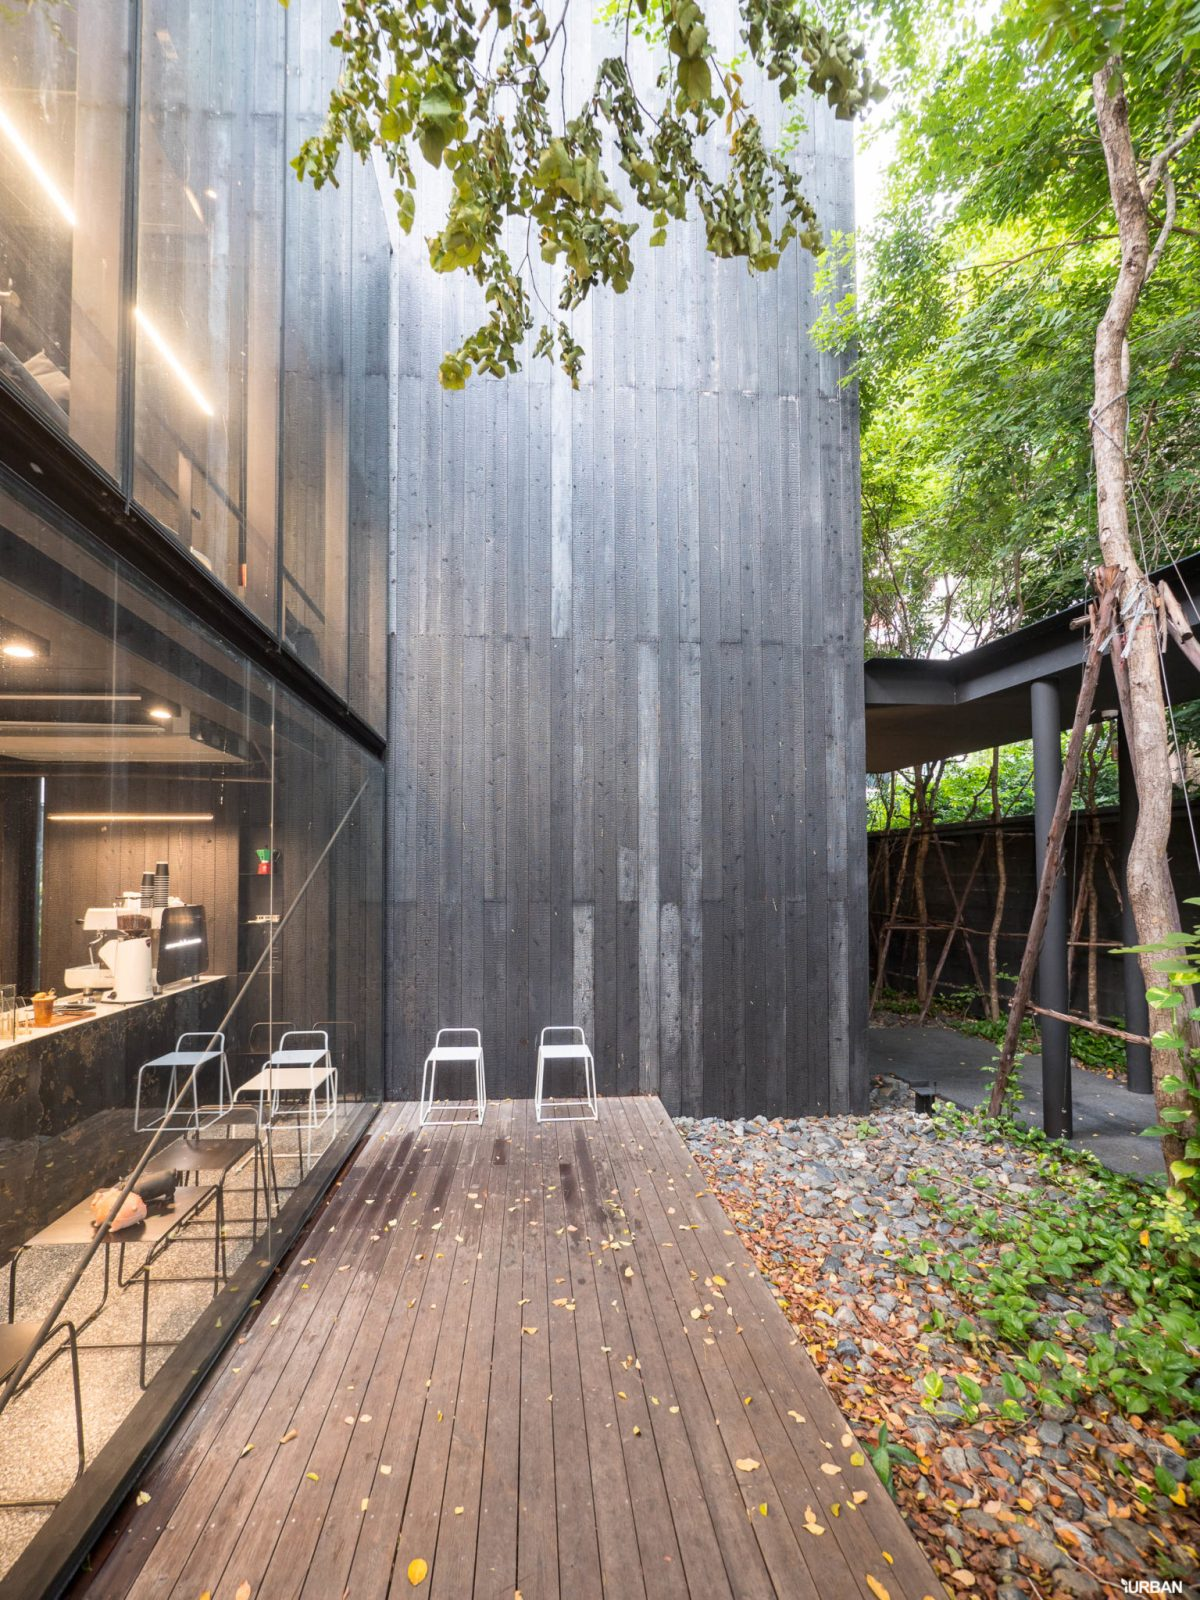 MODERNISM: ARCHITECT CAFE คาเฟ่ที่จะทำให้คุณได้ทึ่งพร้อมสัมผัสของจริงกับงานสถาปัตยกรรมสไตล์ modern 17 -